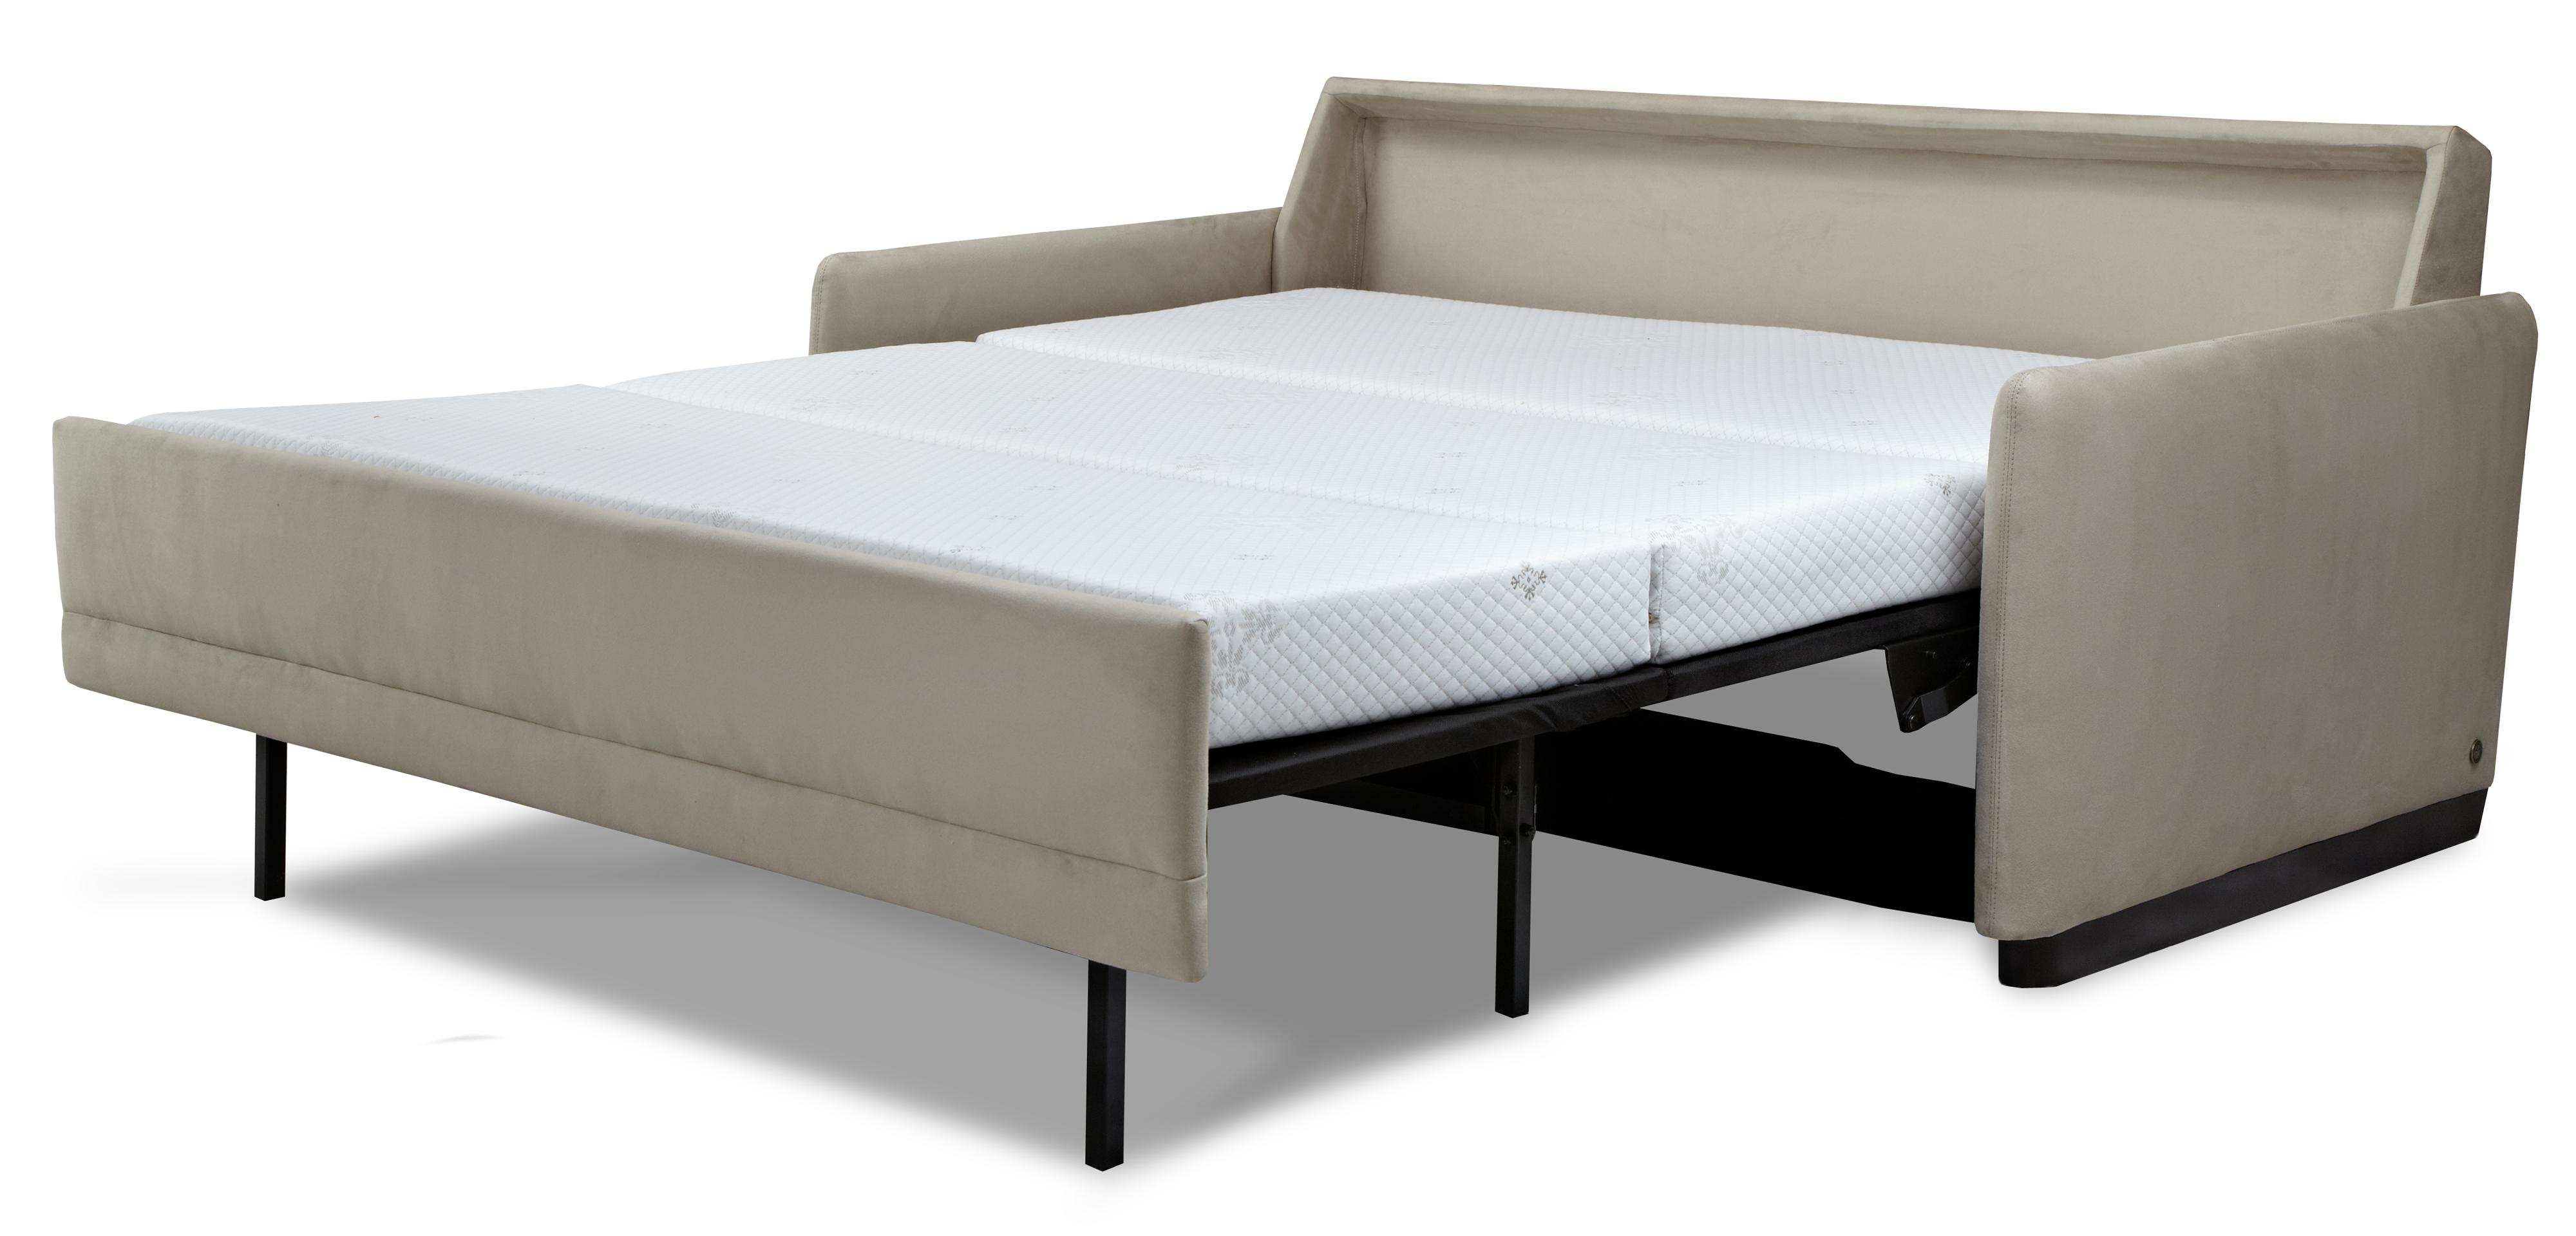 American Leather Comfort Sleeper Hailey Queen Plus Sofa